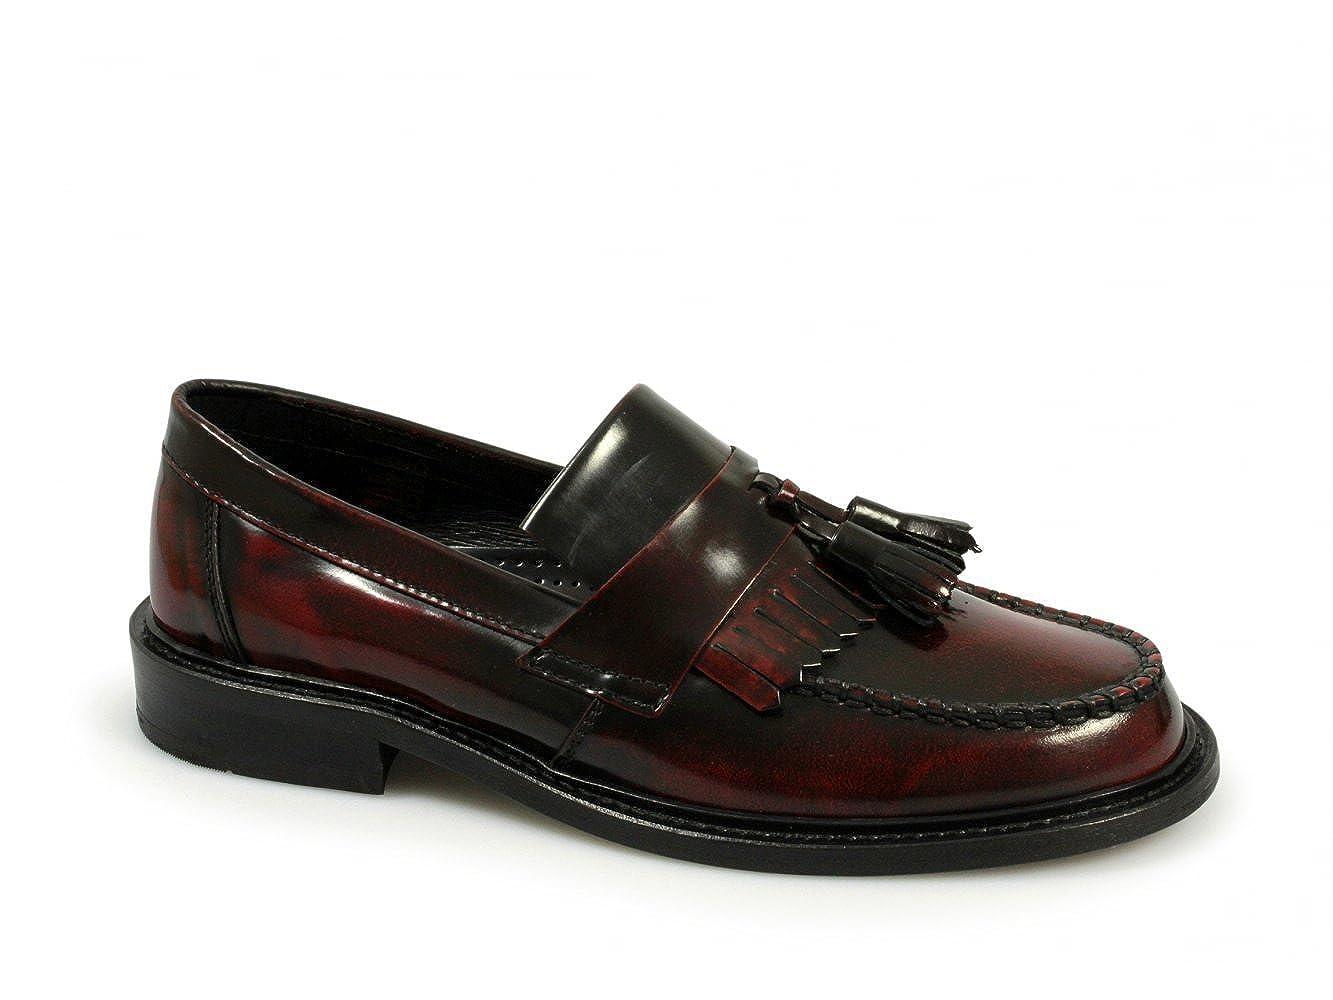 6c35bcf4e0438 Ikon SELECTA Mens MOD Skinhead Polished All Leather Tassle Loafers Oxblood  Red